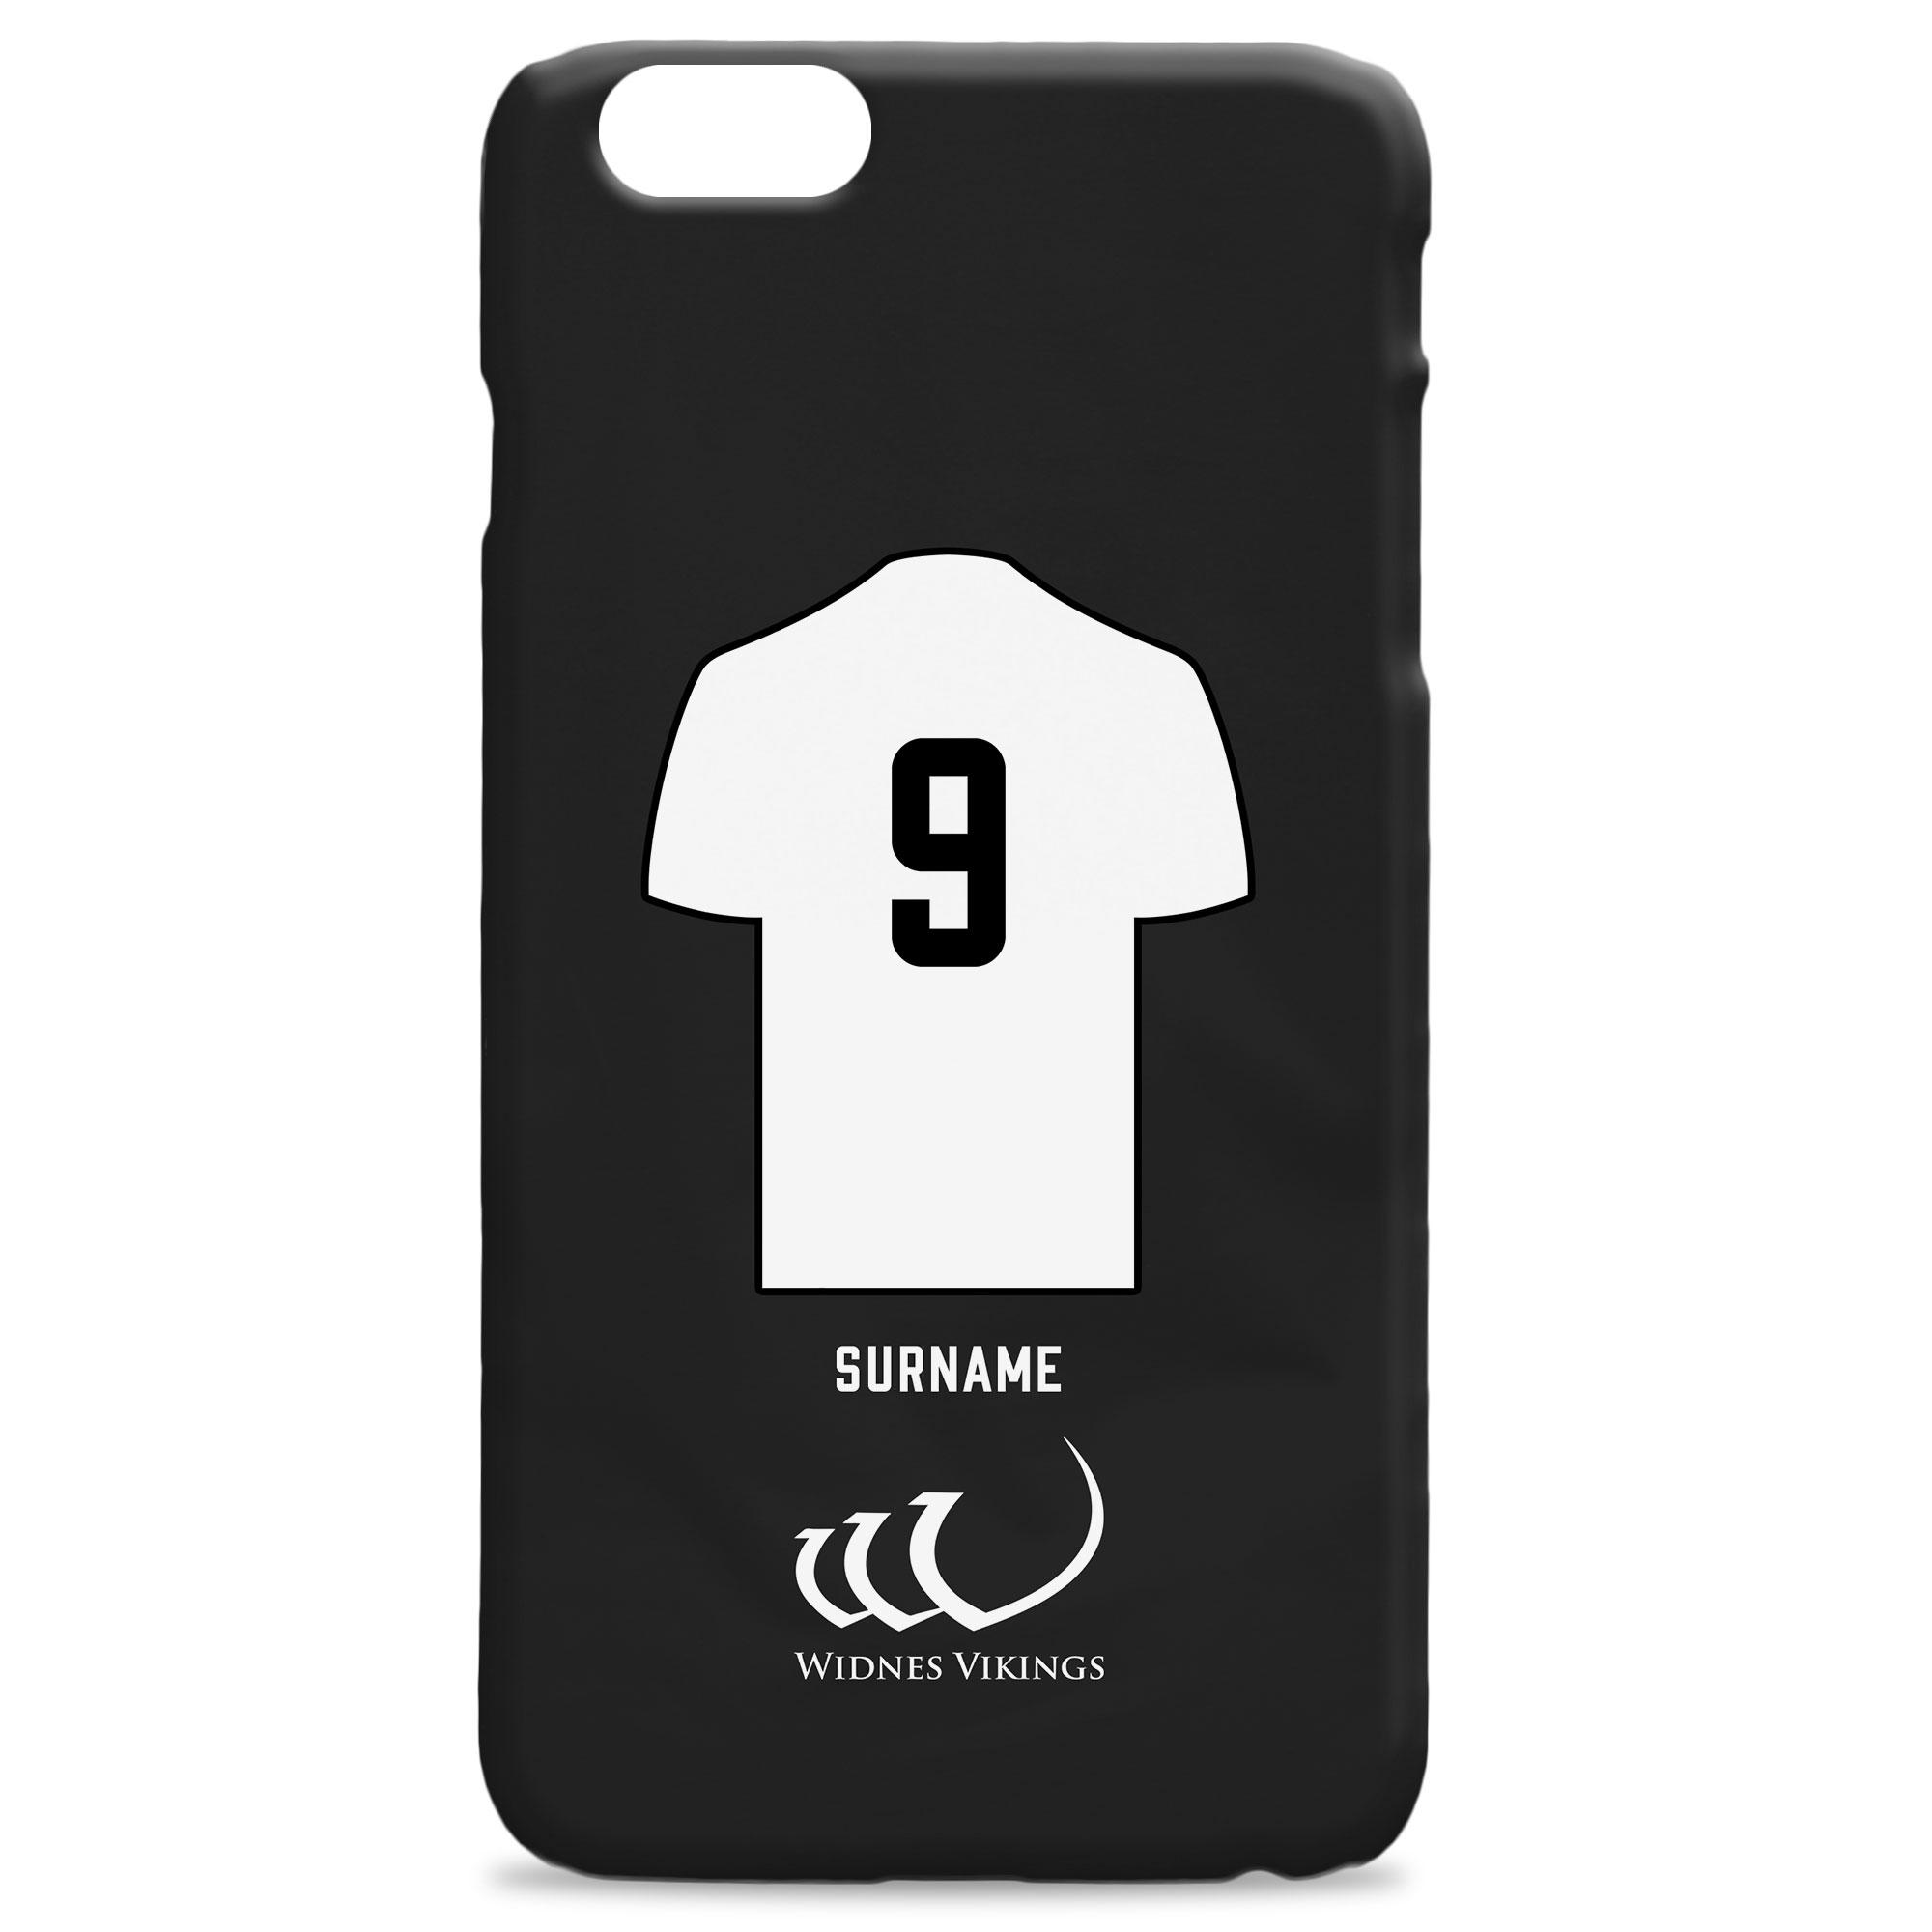 Widnes Vikings Shirt Hard Back Phone Case